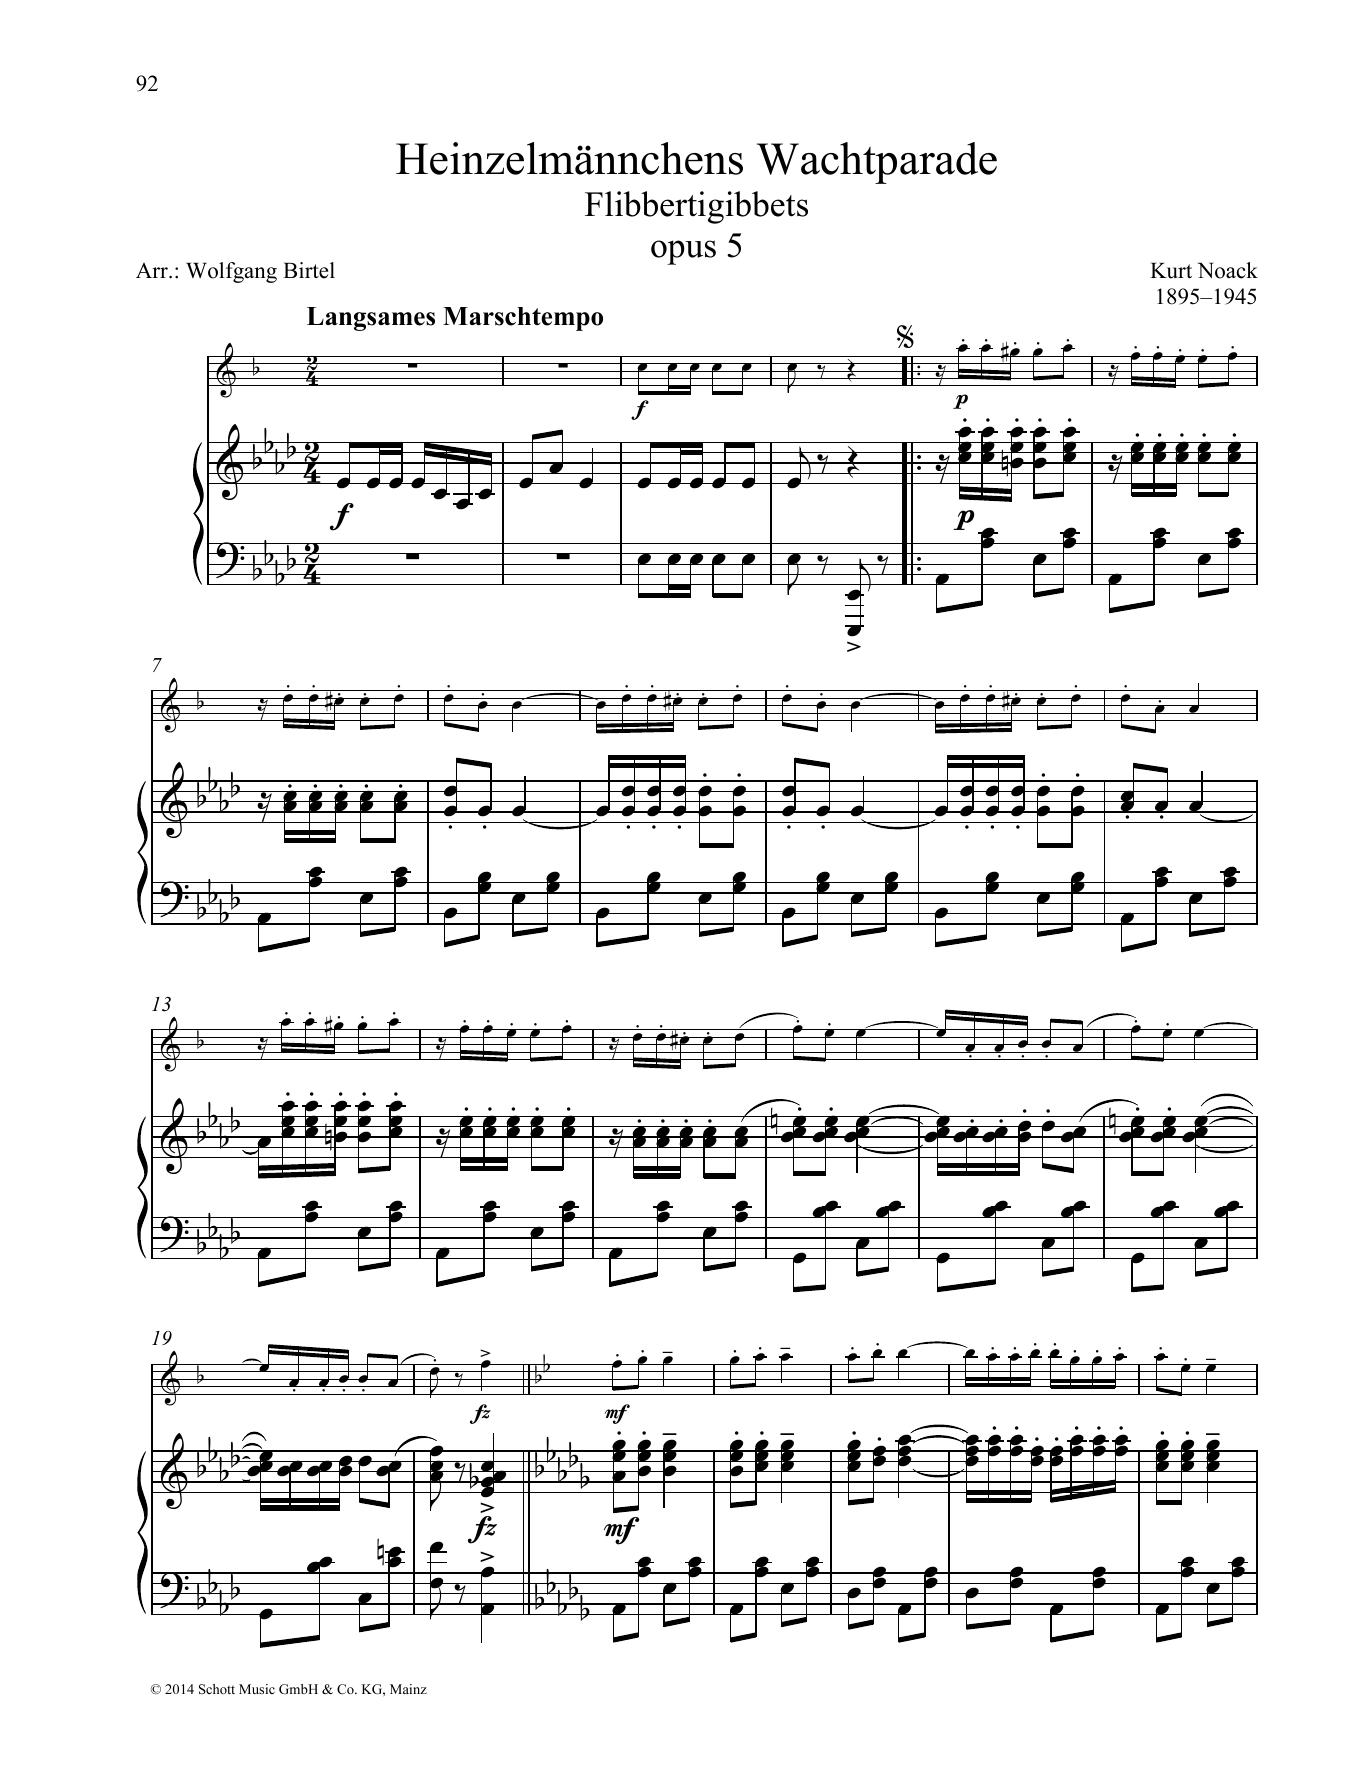 Flibbertigibbets Sheet Music